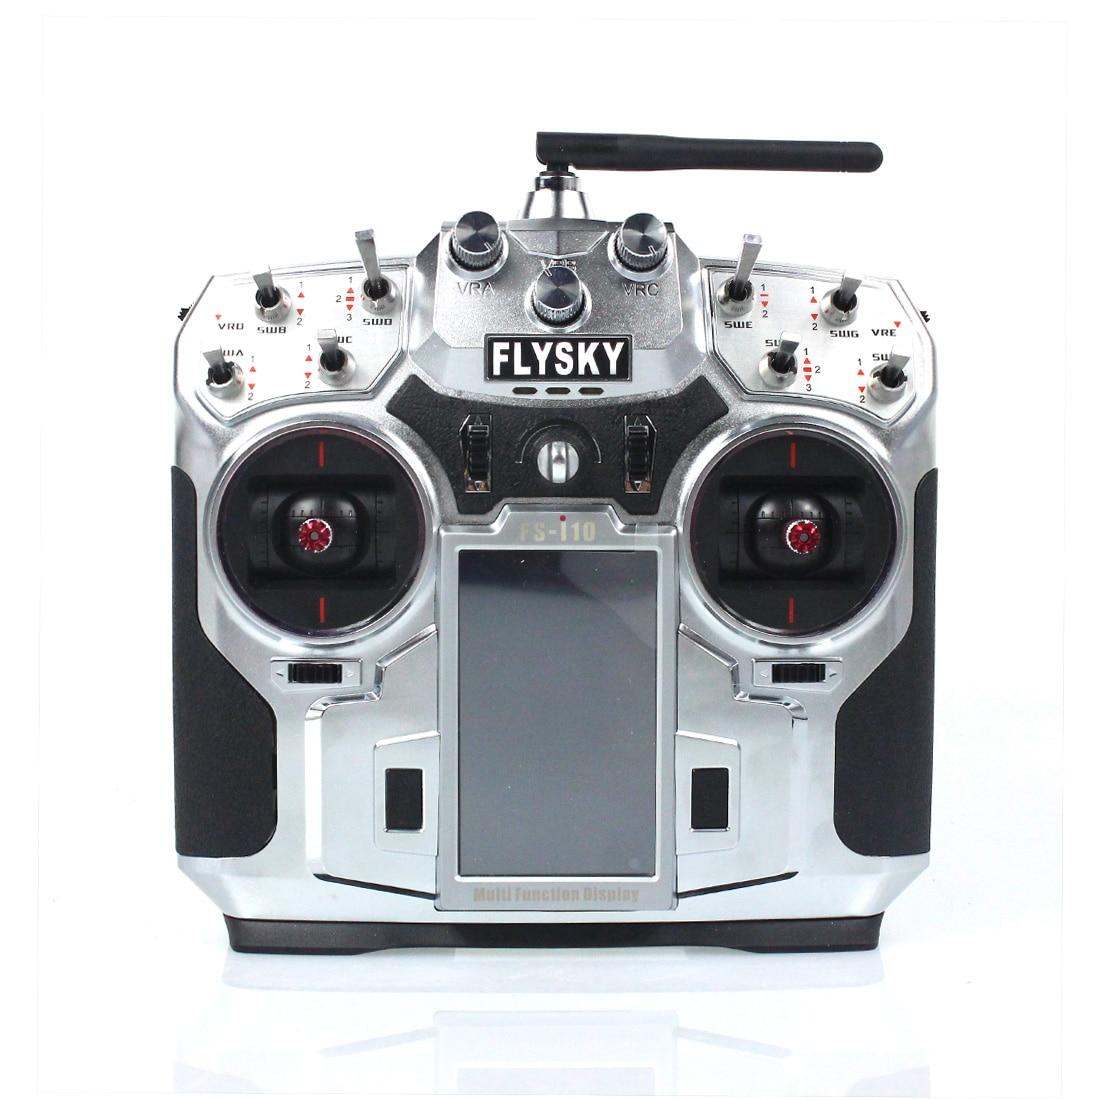 F16276/F16277 FS FlySky FS-i10 T6 2.4g Digital Proportional 10 Channel Transmitter And Receiver System 3.55